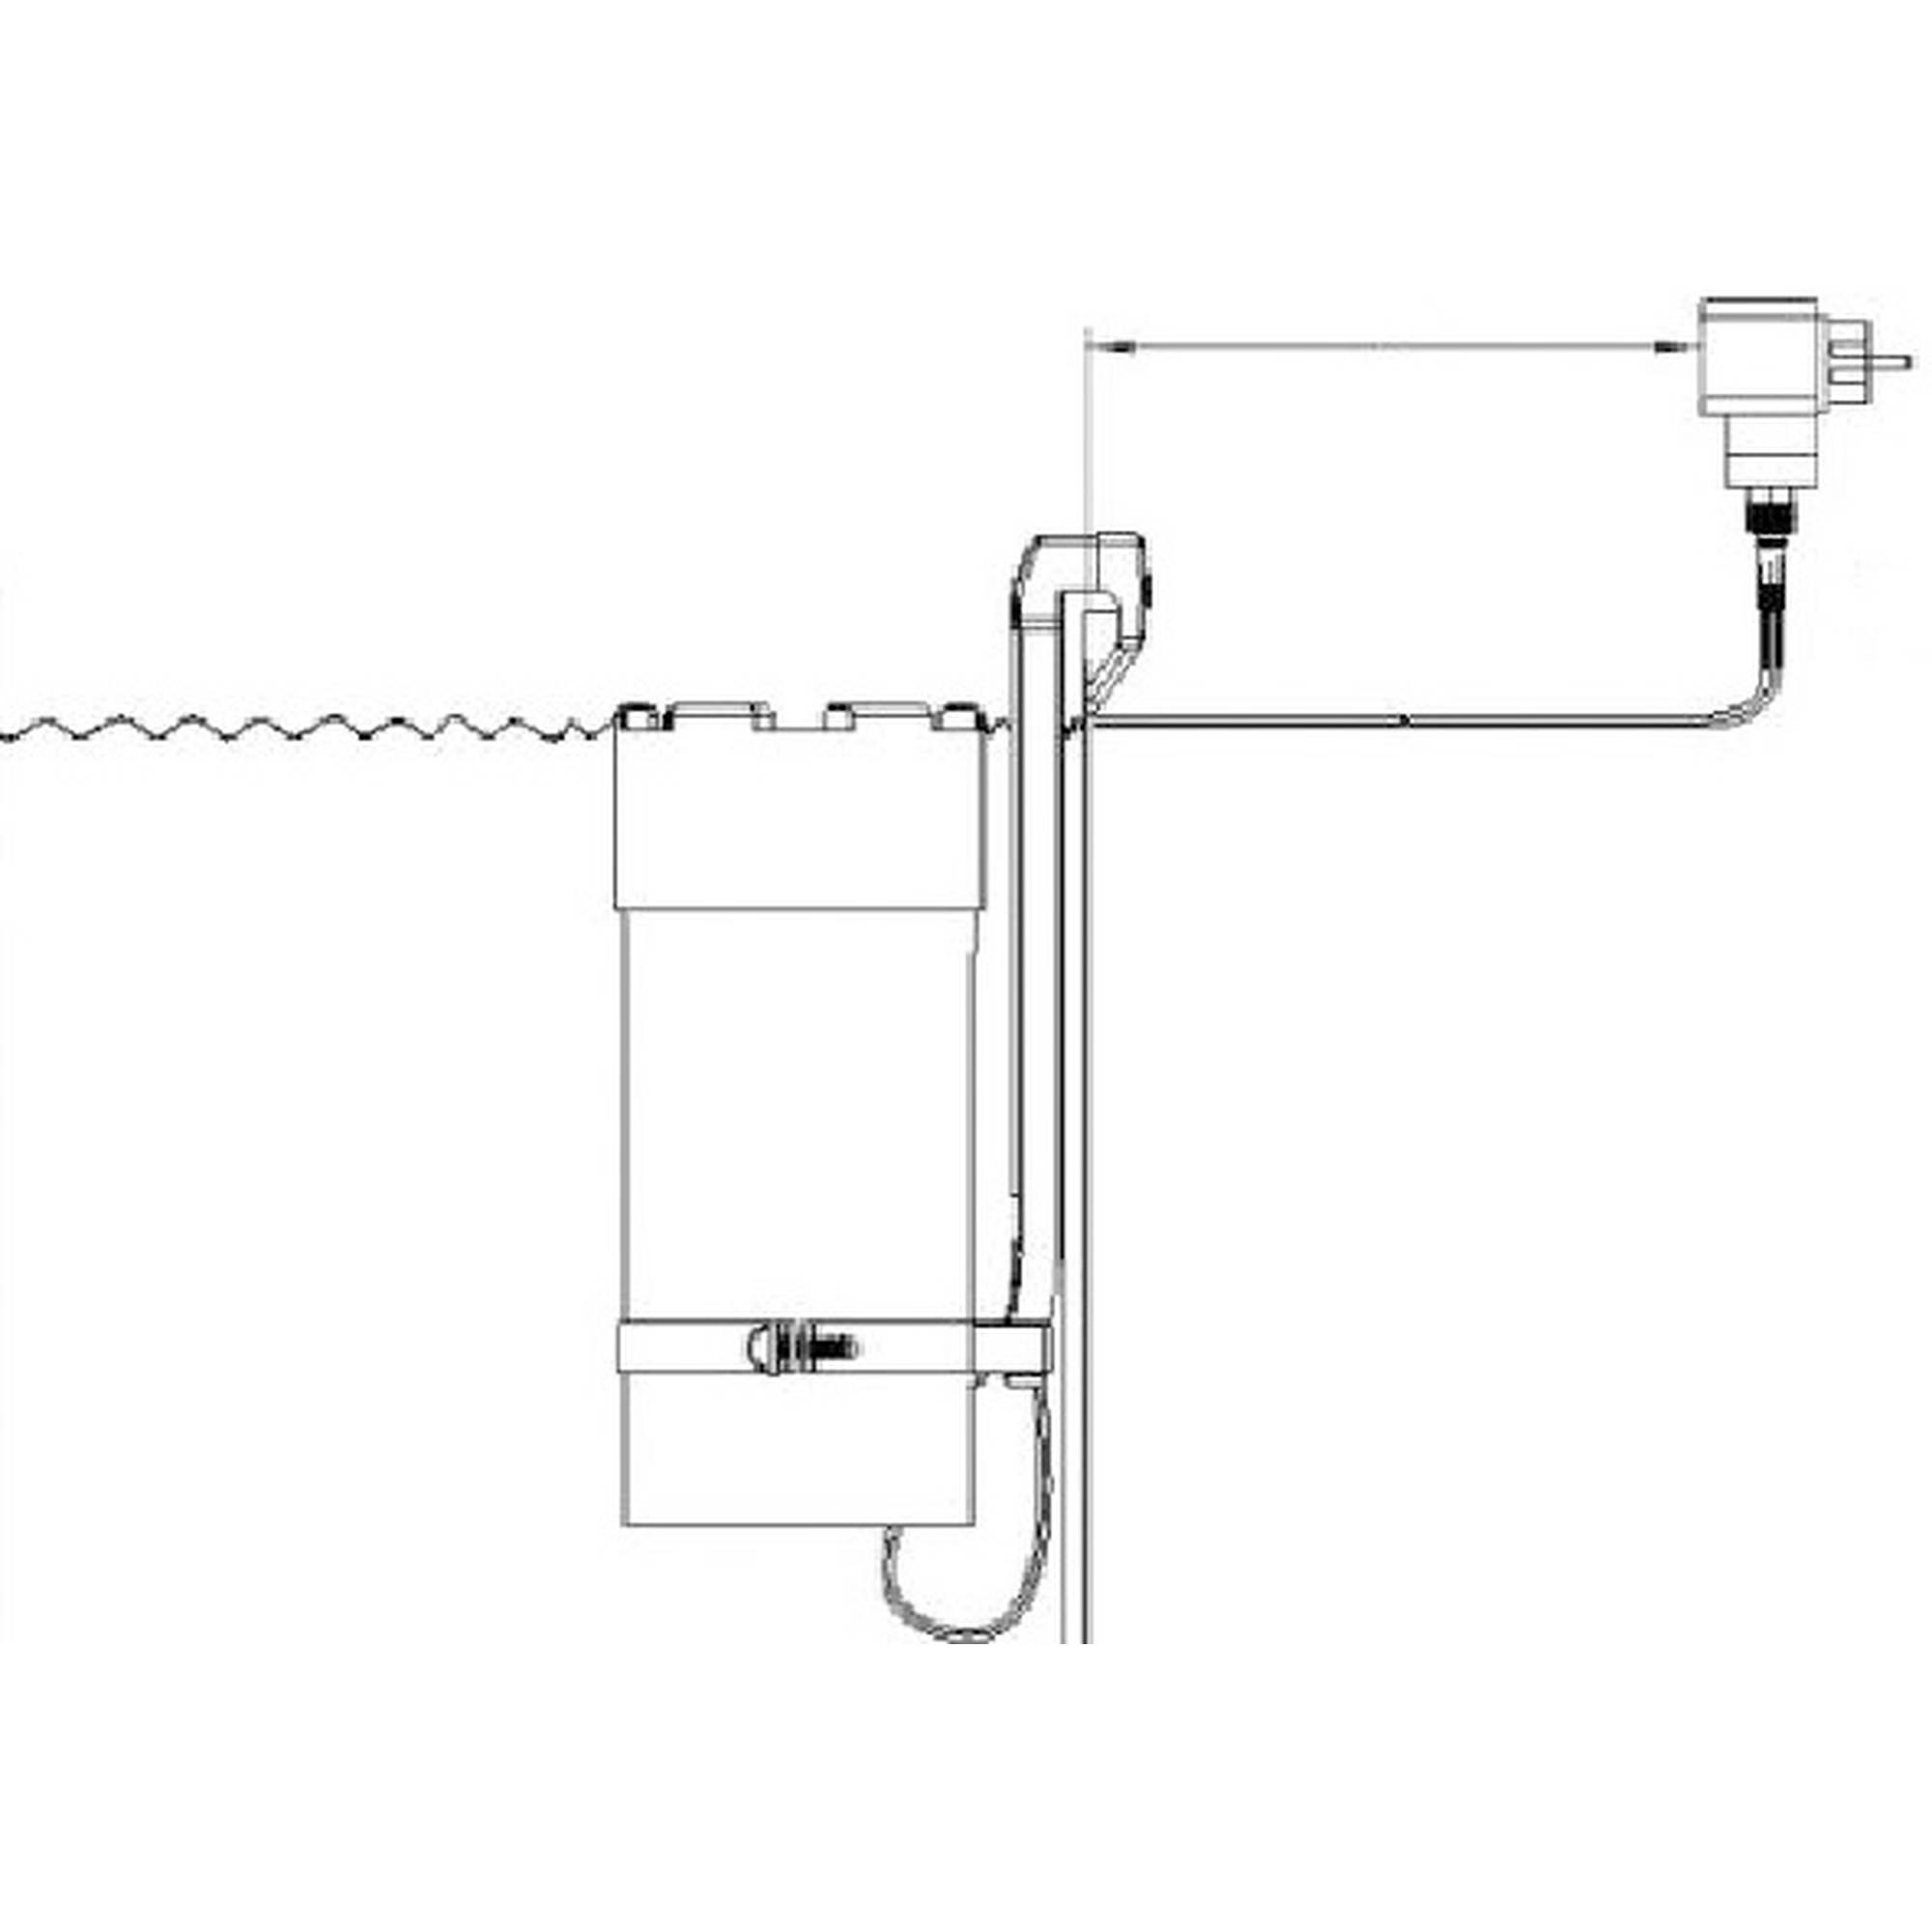 PLANET POOL Rundbecken-Set Anthrazit 450x90cm, 3 teilig